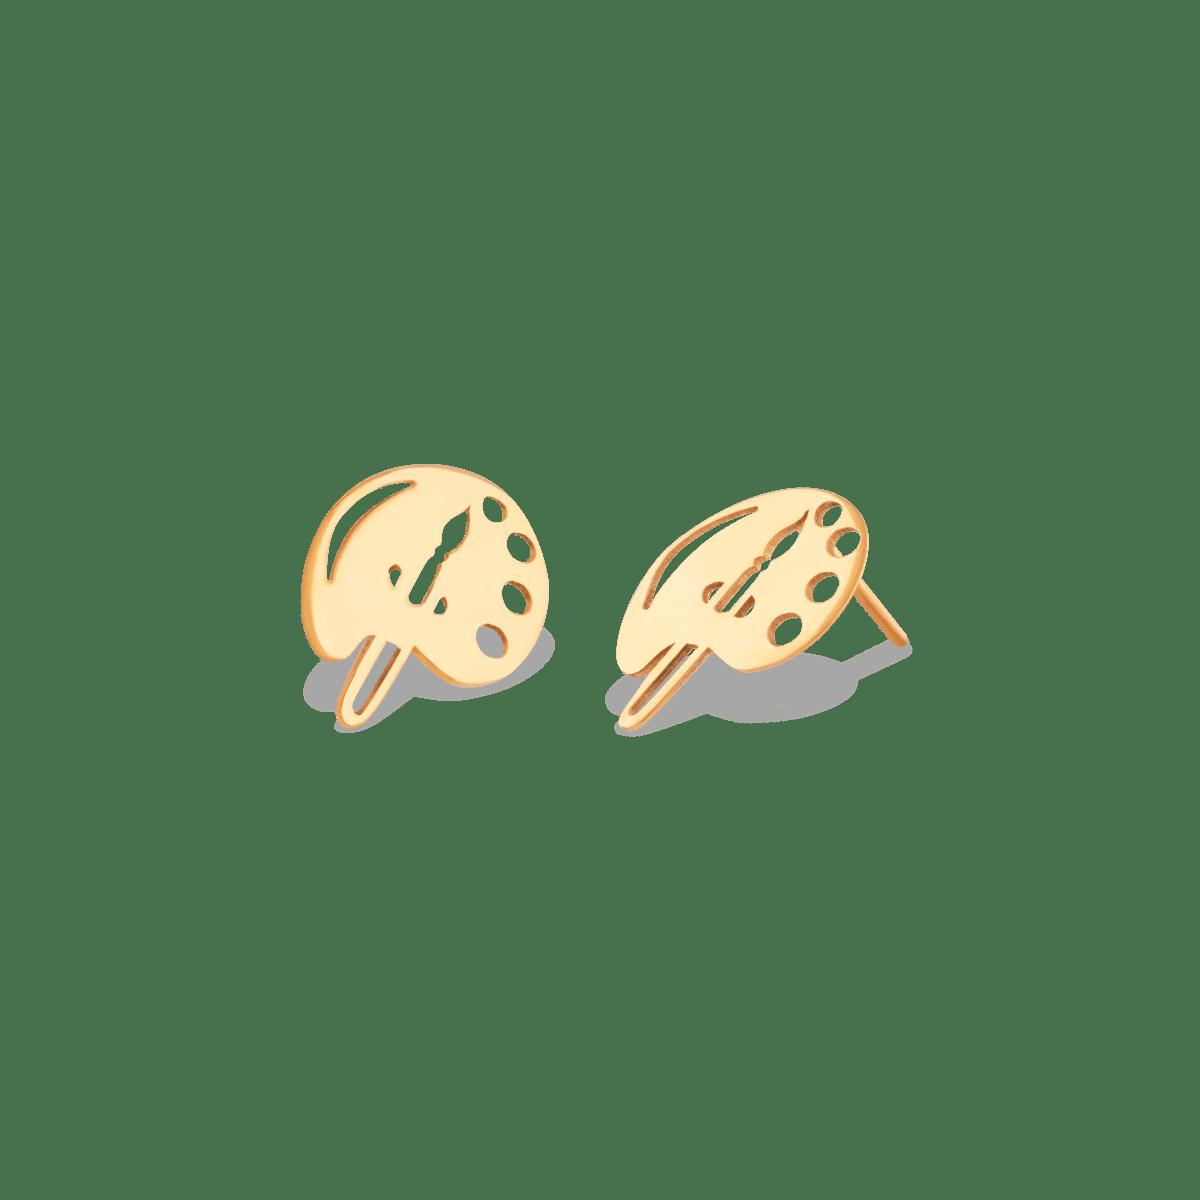 گوشواره طلا پالت رنگ